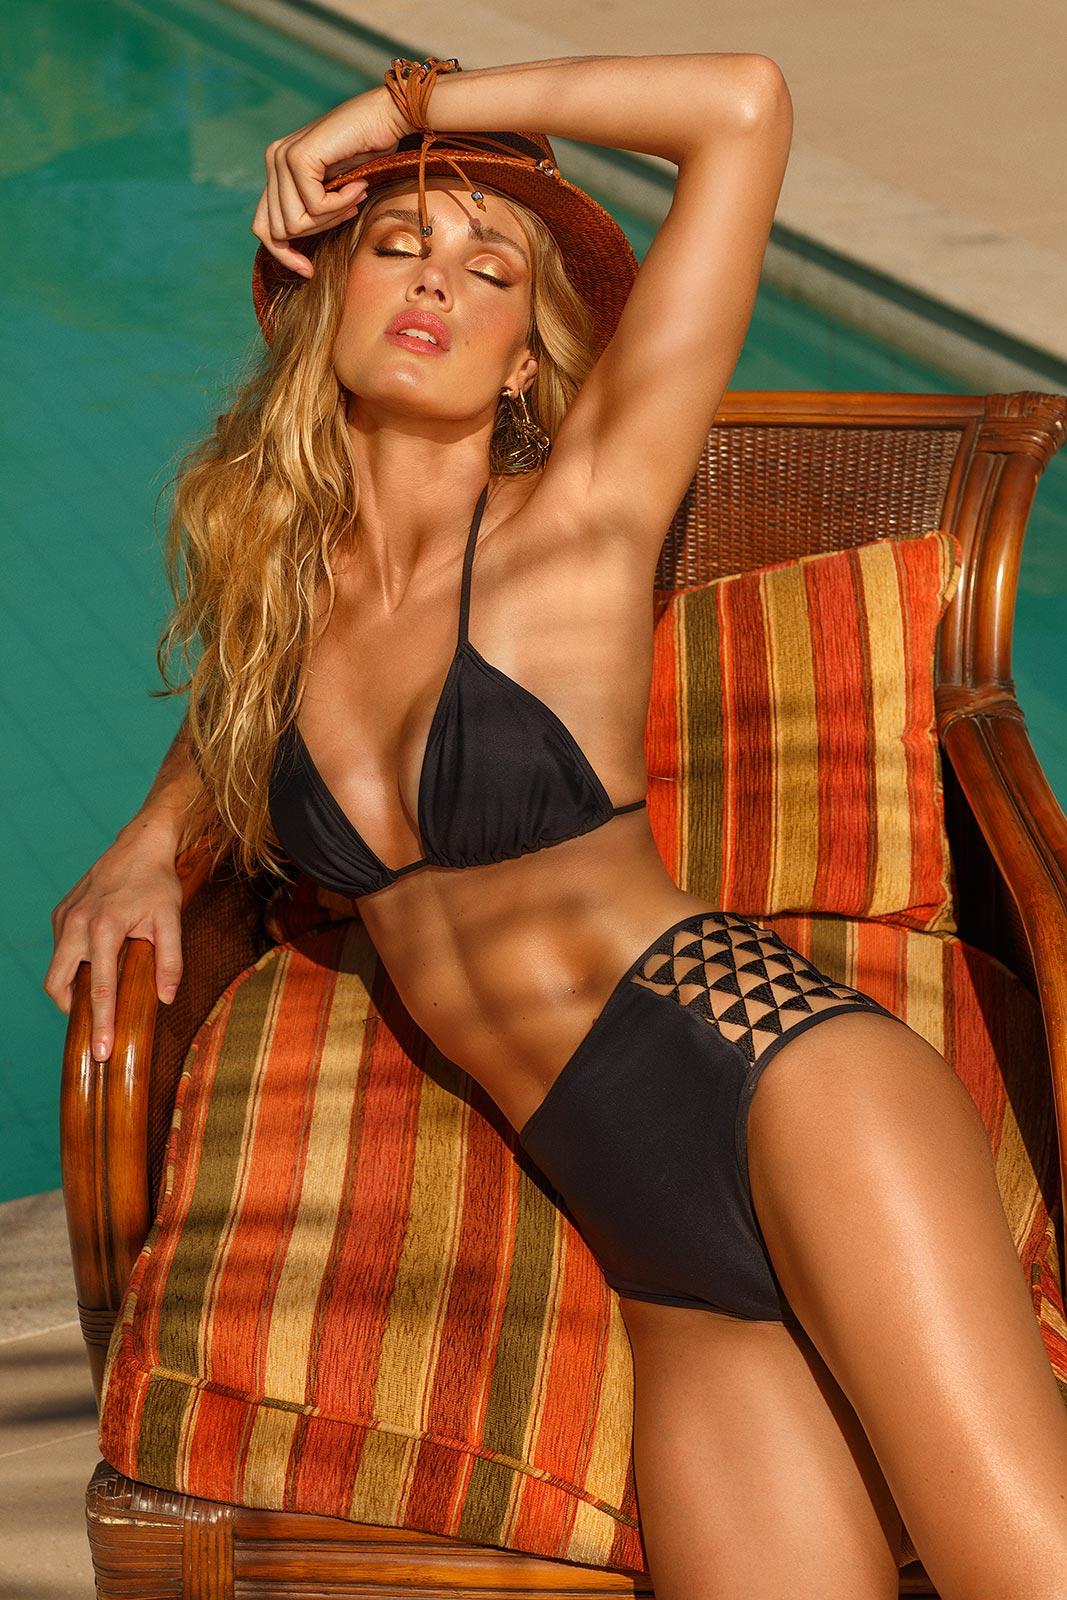 Bikini Negro Talla Grande A La Cintura Con Costados Calados Mar De Espanha Hy Brasil